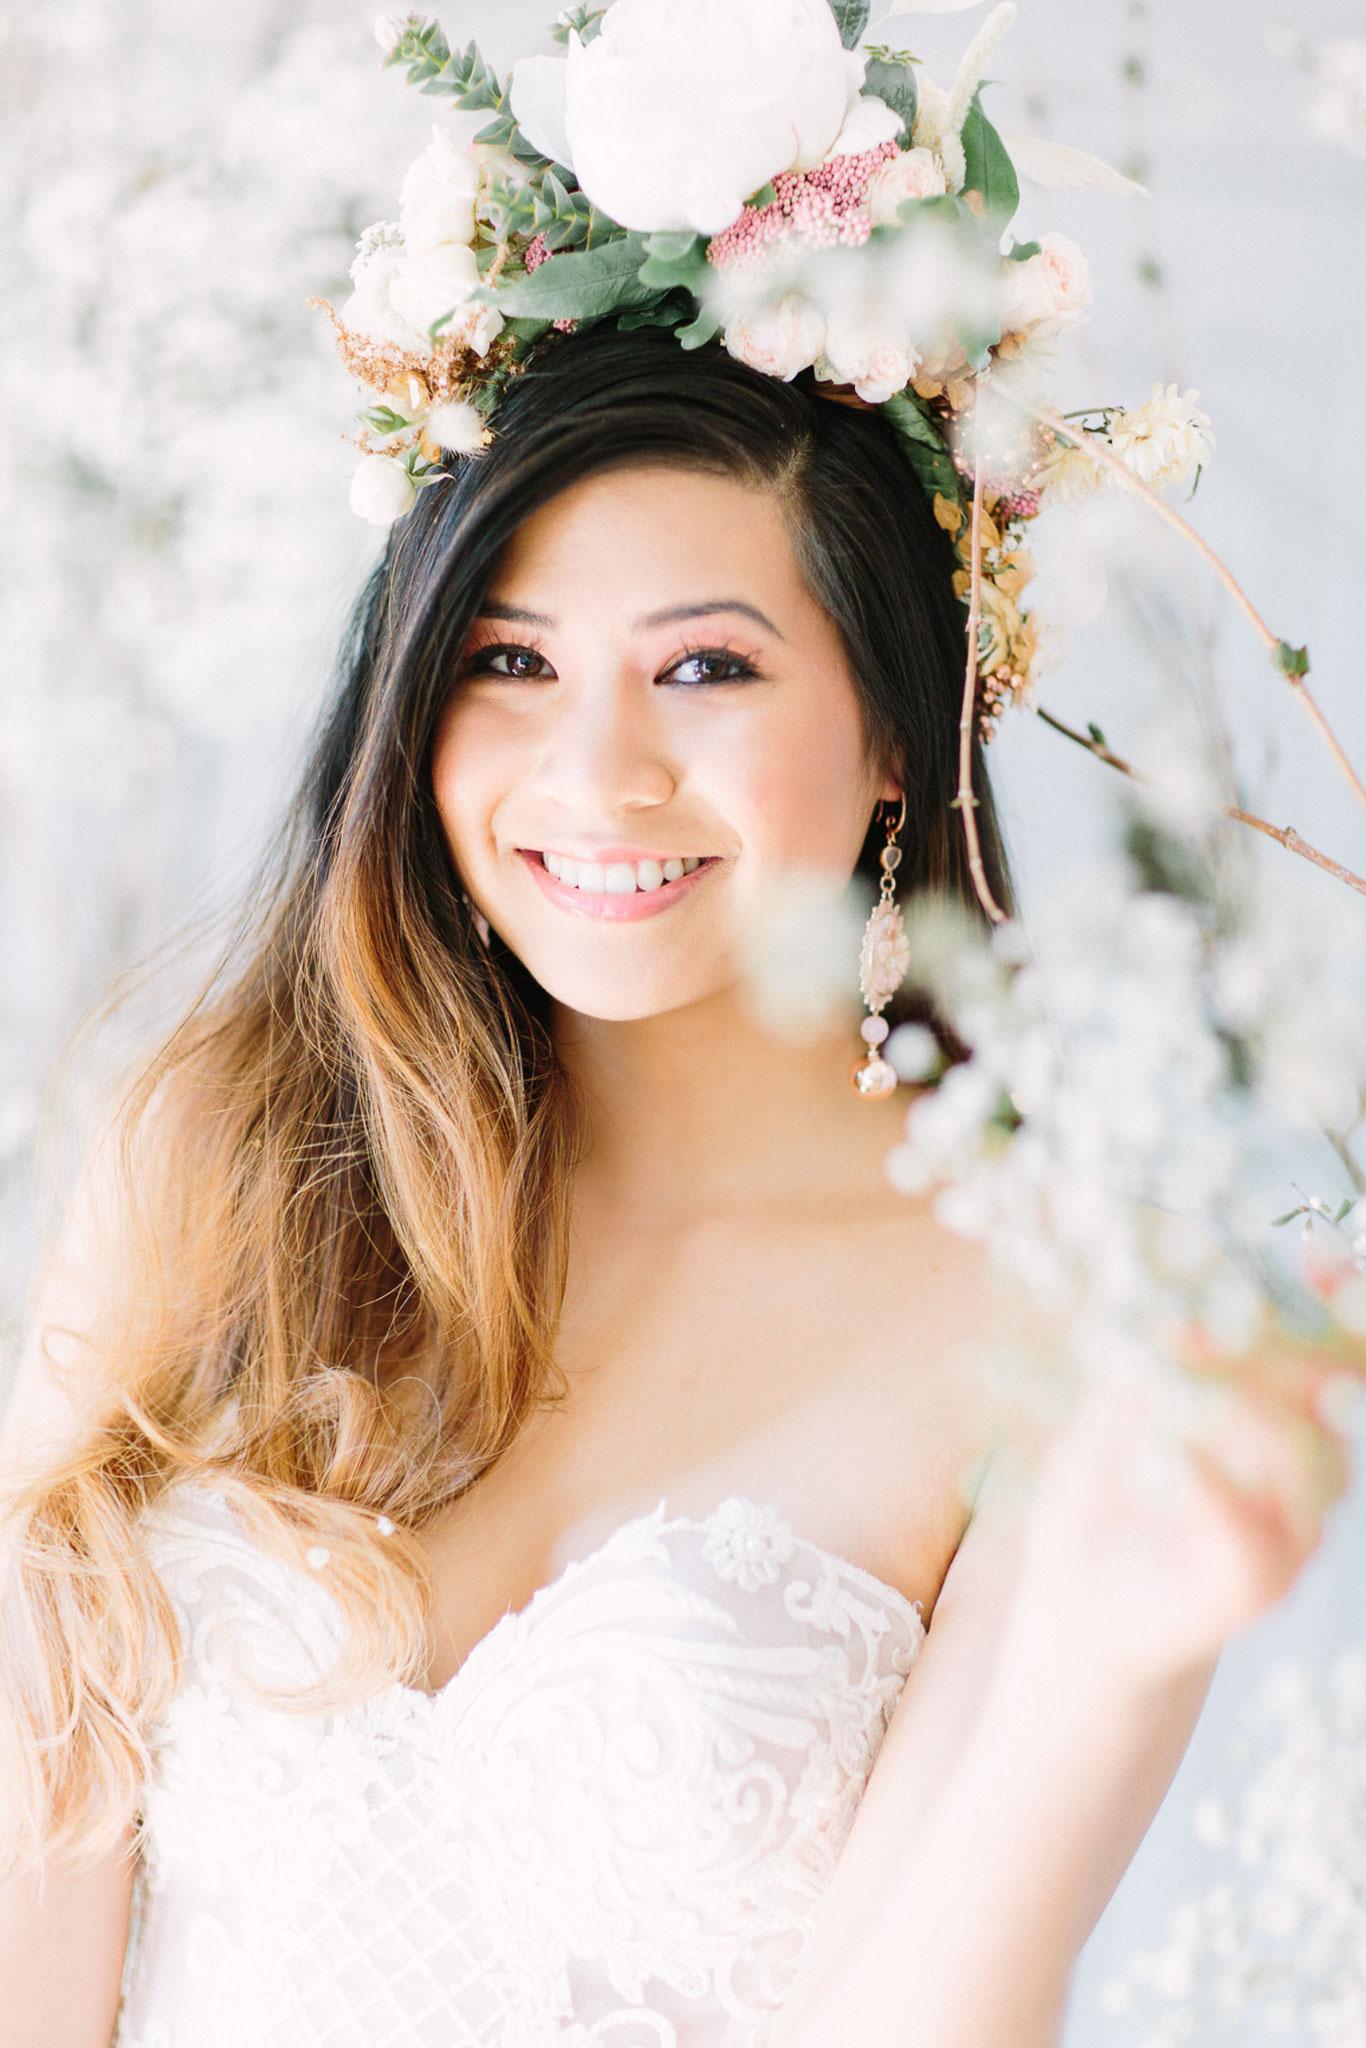 H&M: Janine Stelling Brautstyling | Foto: ZoKa-Fotografen | Planung: marrylight Hochzeitsplanung